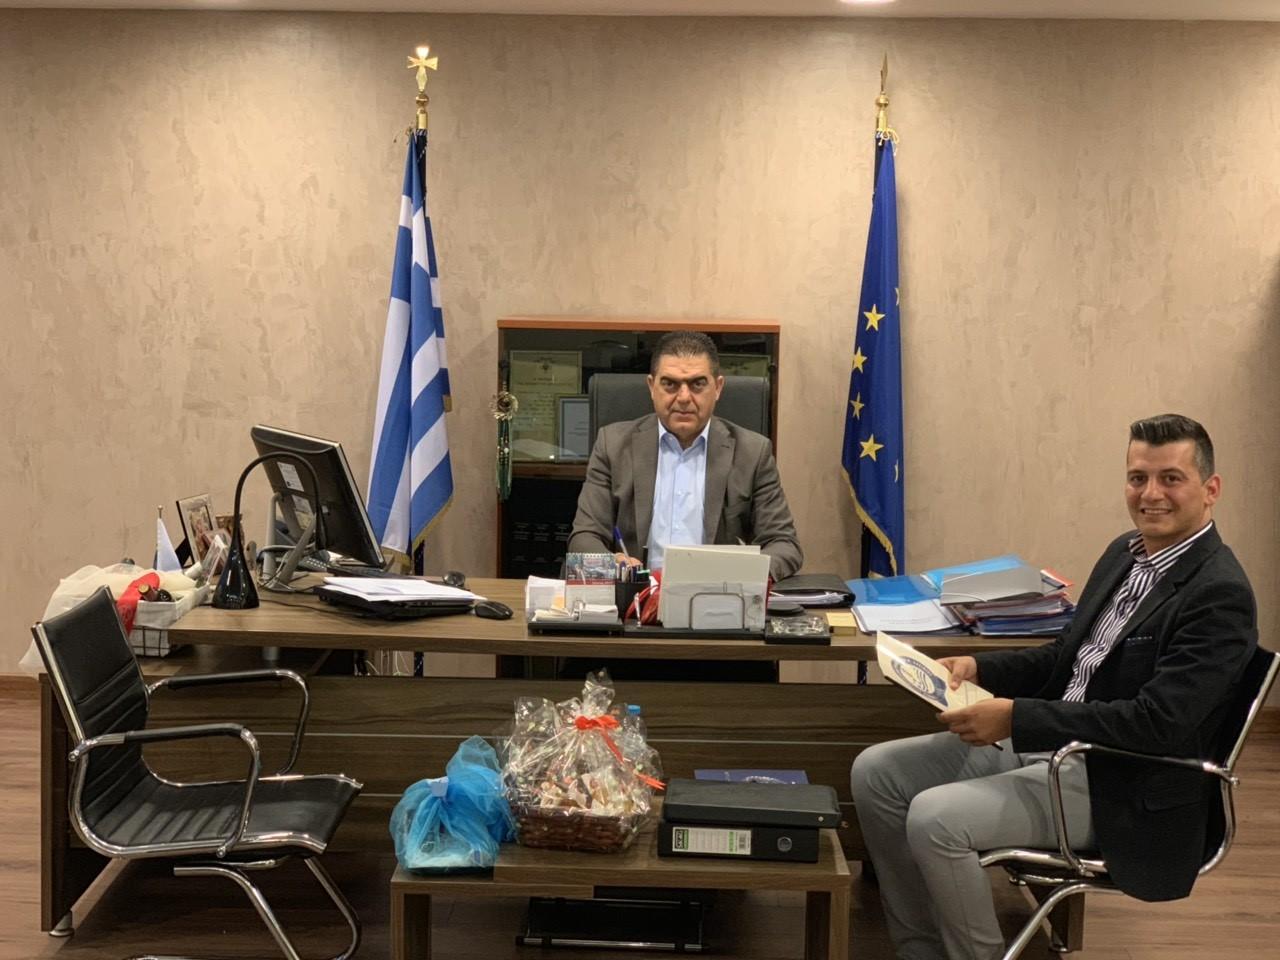 <p>Την Τρίτη, 04/06/2019, πραγματοποιήθηκε συνάντηση του προέδρου ΚΑΡΤΣΑΚΗ Γεωργίου της Ένωσης μας, με τον με τον Προϊστάμενο Επιτελείου ΕΛ.ΑΣ Αντιστράτηγο κ. ΔΑΣΚΑΛΑΚΗ Ανδρέα.  Στην συνάντηση που πραγματοποιήθηκε στο Αρχηγείο της ΕΛ.ΑΣ, ο Επιτελάρχης ενημερώθηκε για τα προβλήματα που έχουν προκύψει τον τελευταίο καιρό, στους Αστυνομικούς του Νομού.  Ακόμα […]</p>